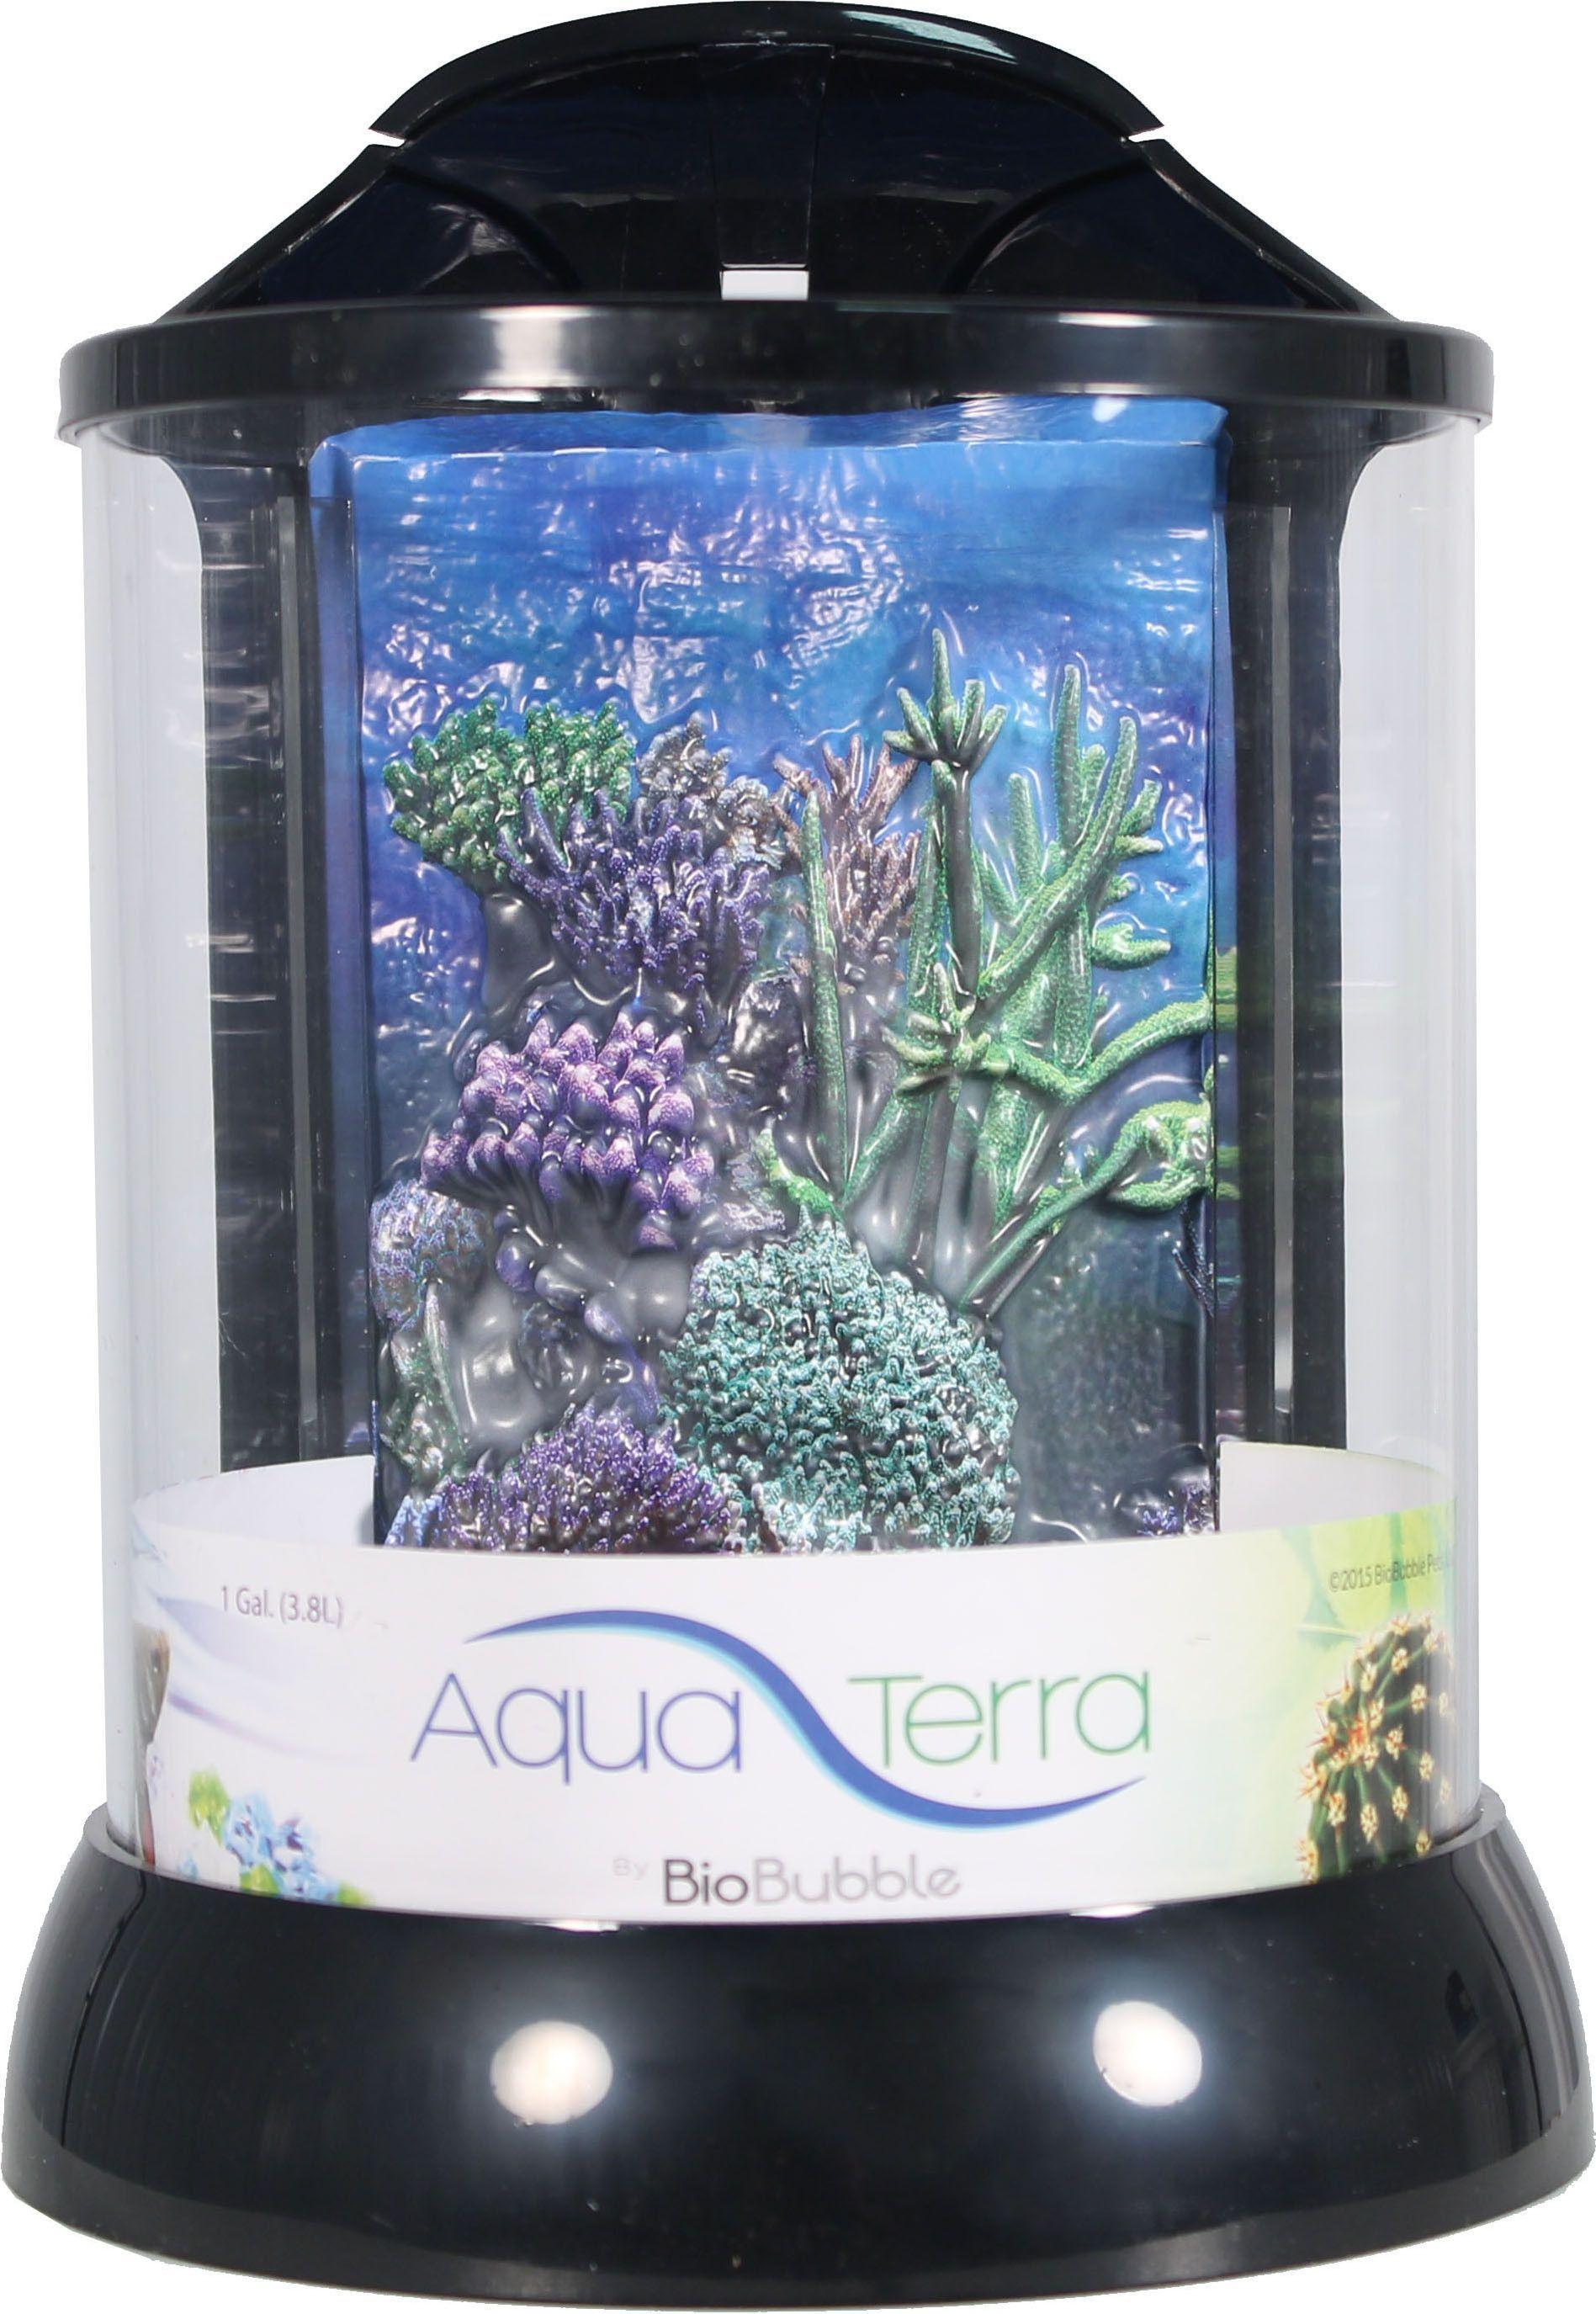 d1724f3738df97d35368d29b3edacae9 Frais De Aquarium Tropical Schème